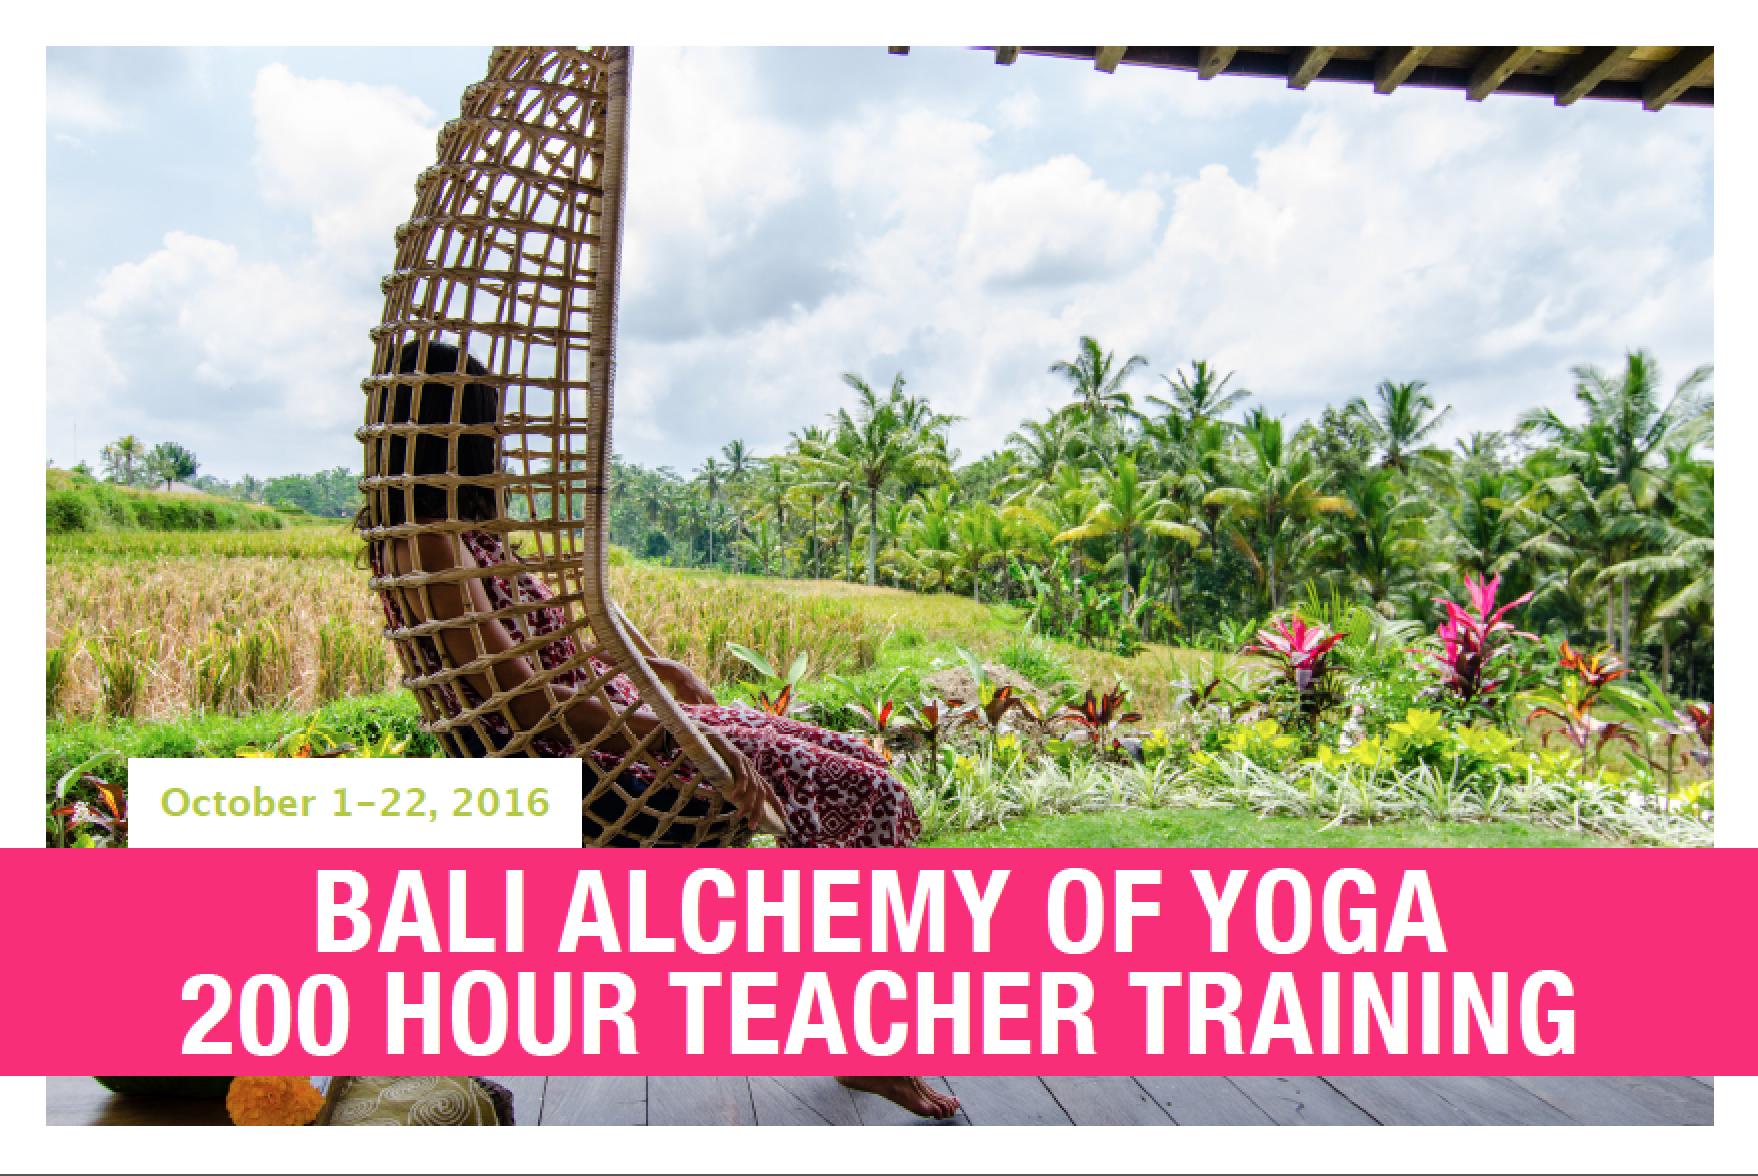 2016 destination yoga teacher training | Silvia Mordini